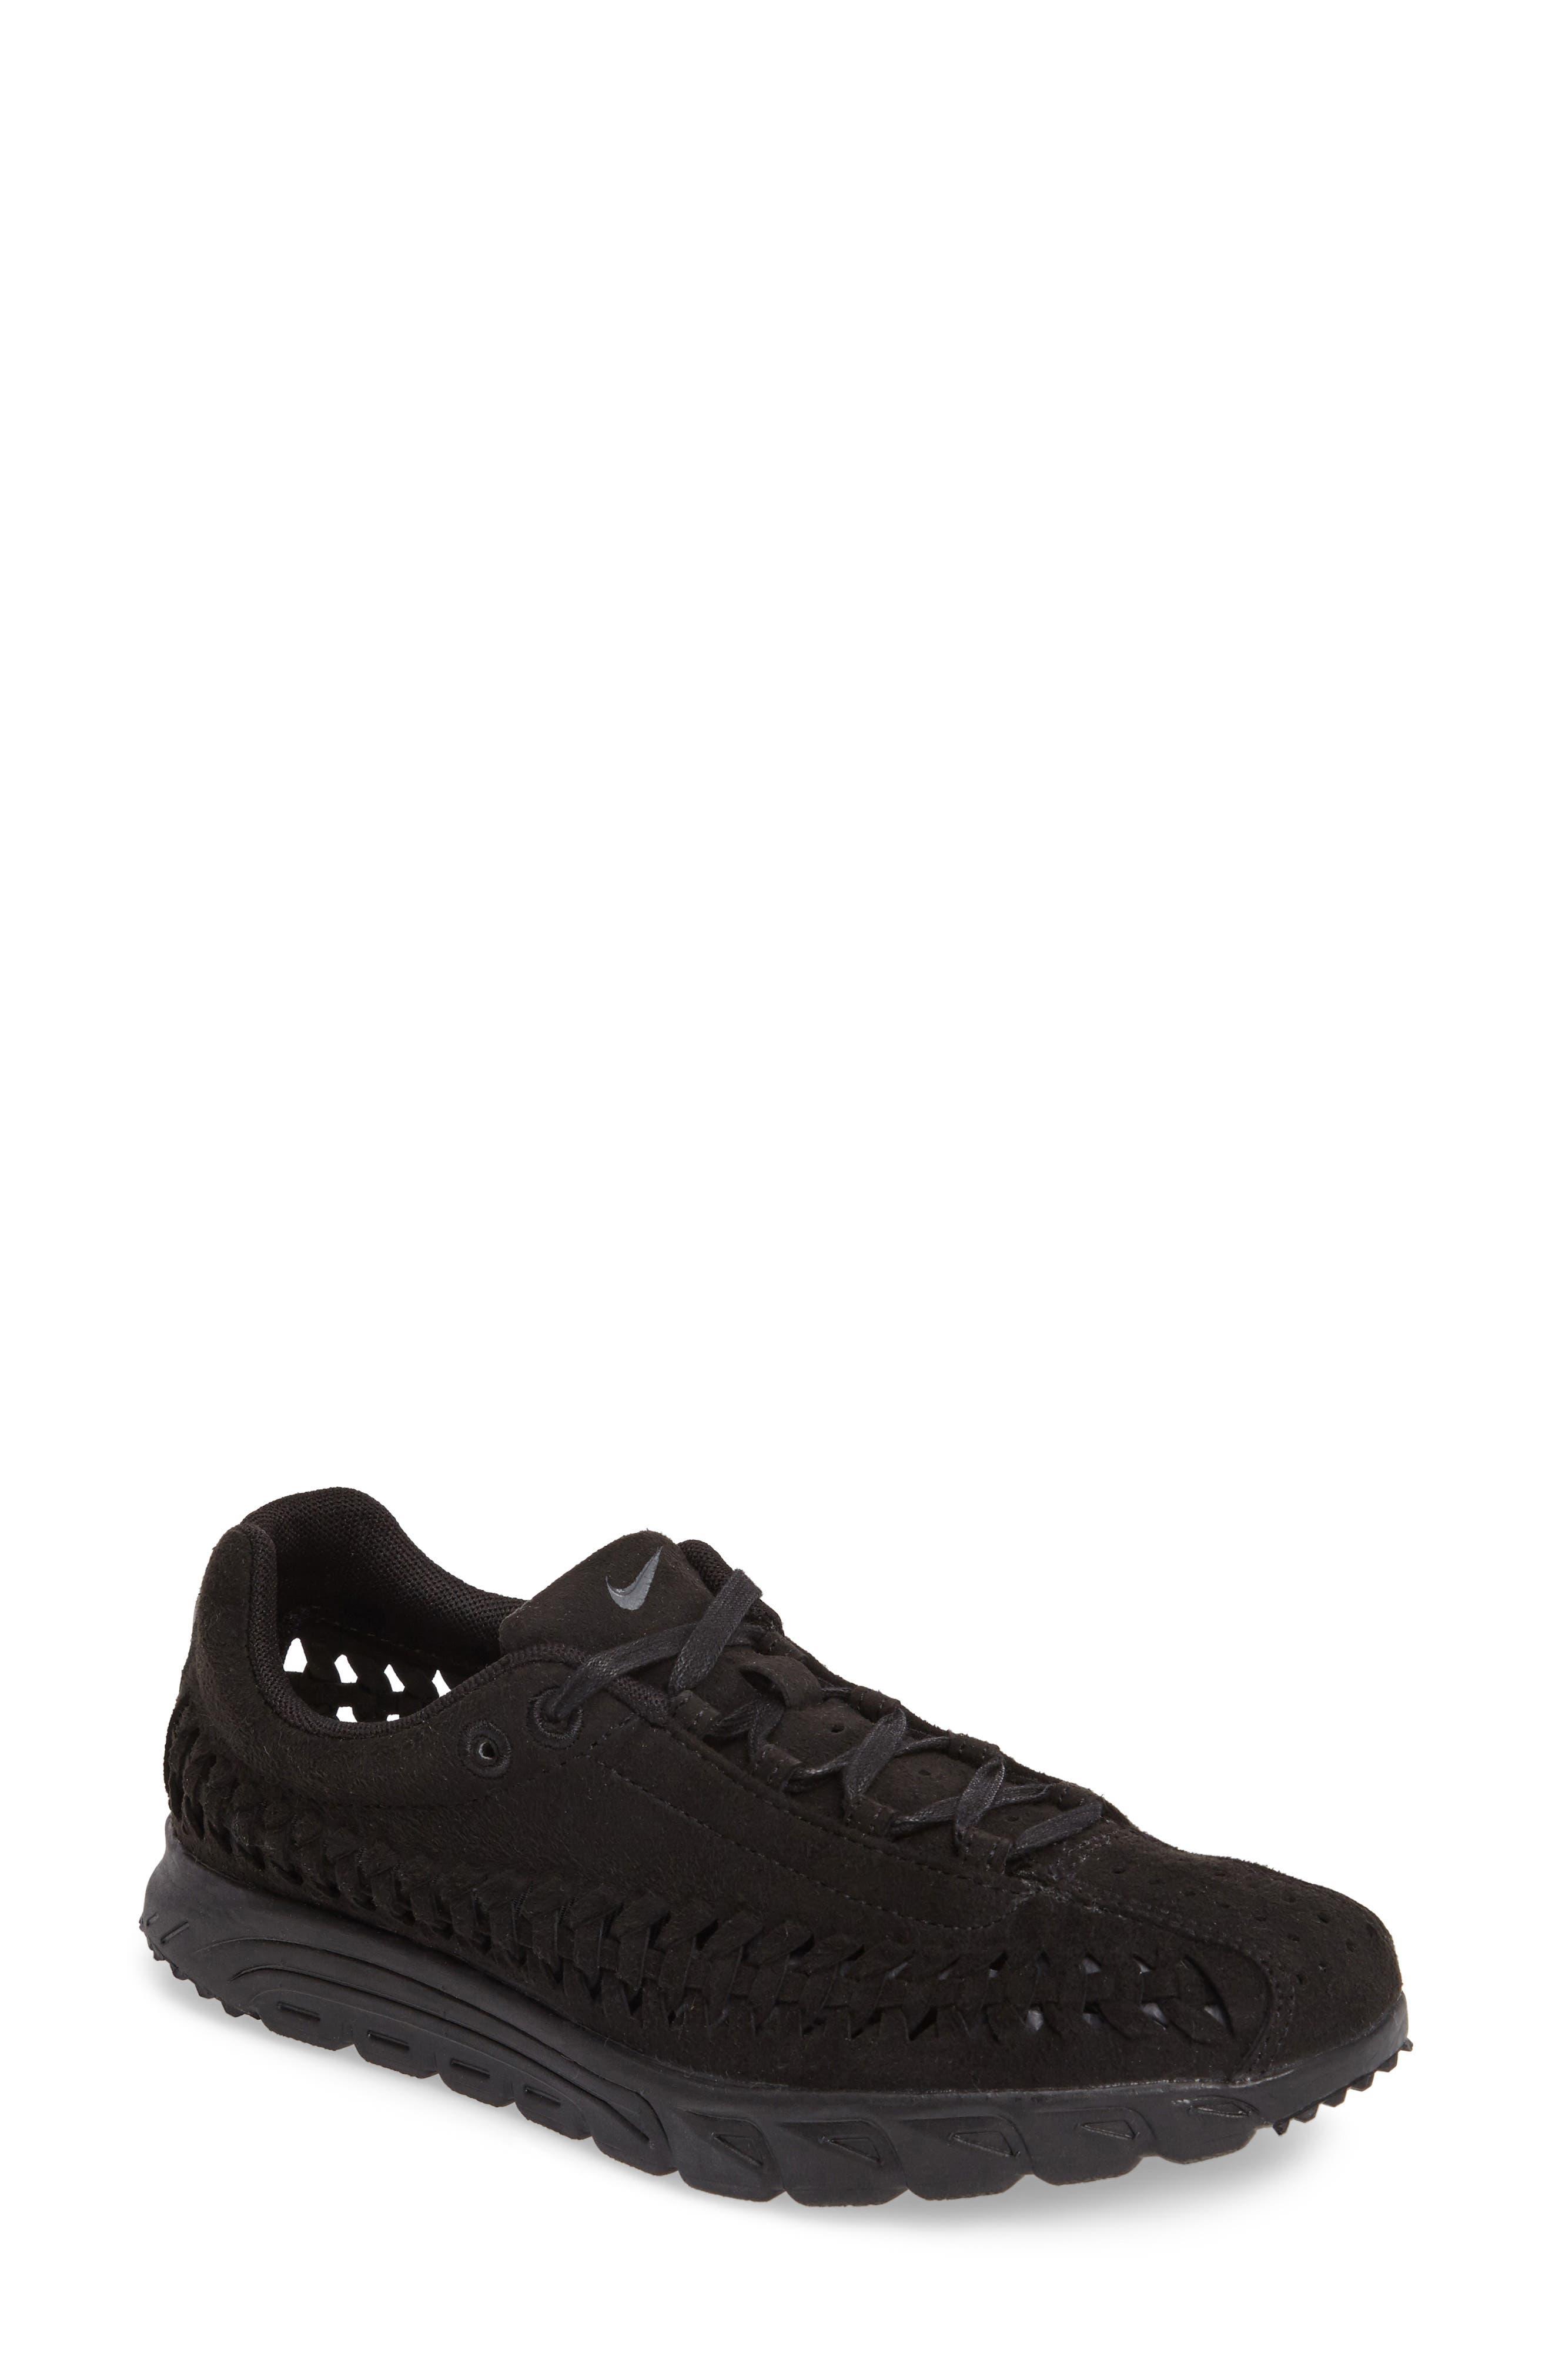 Alternate Image 1 Selected - Nike 'Mayfly Woven' Sneaker (Women)